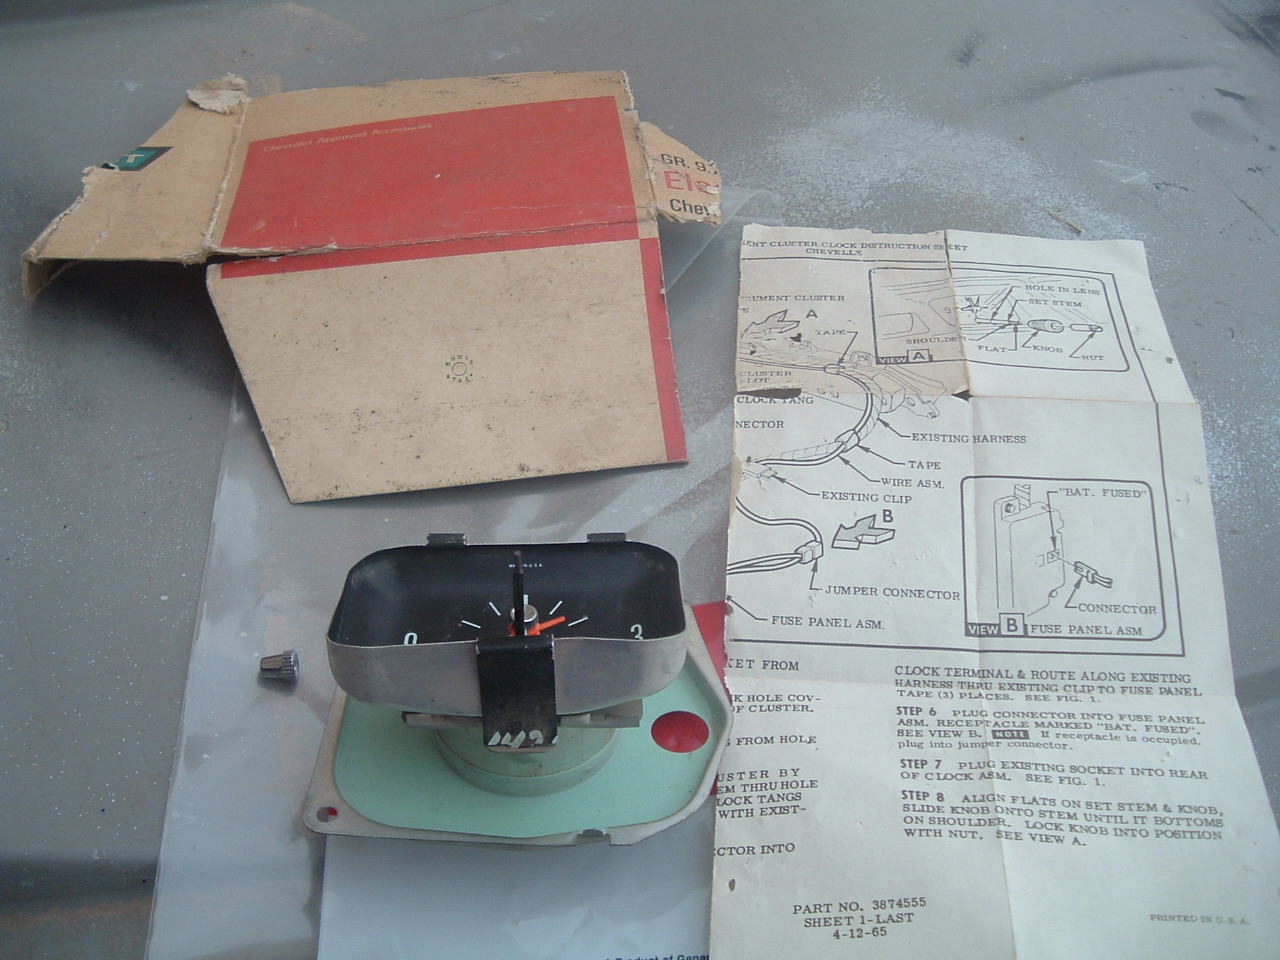 1966 1967 chevelle, malibu dash clock nos gm # 986452 (z 986452)